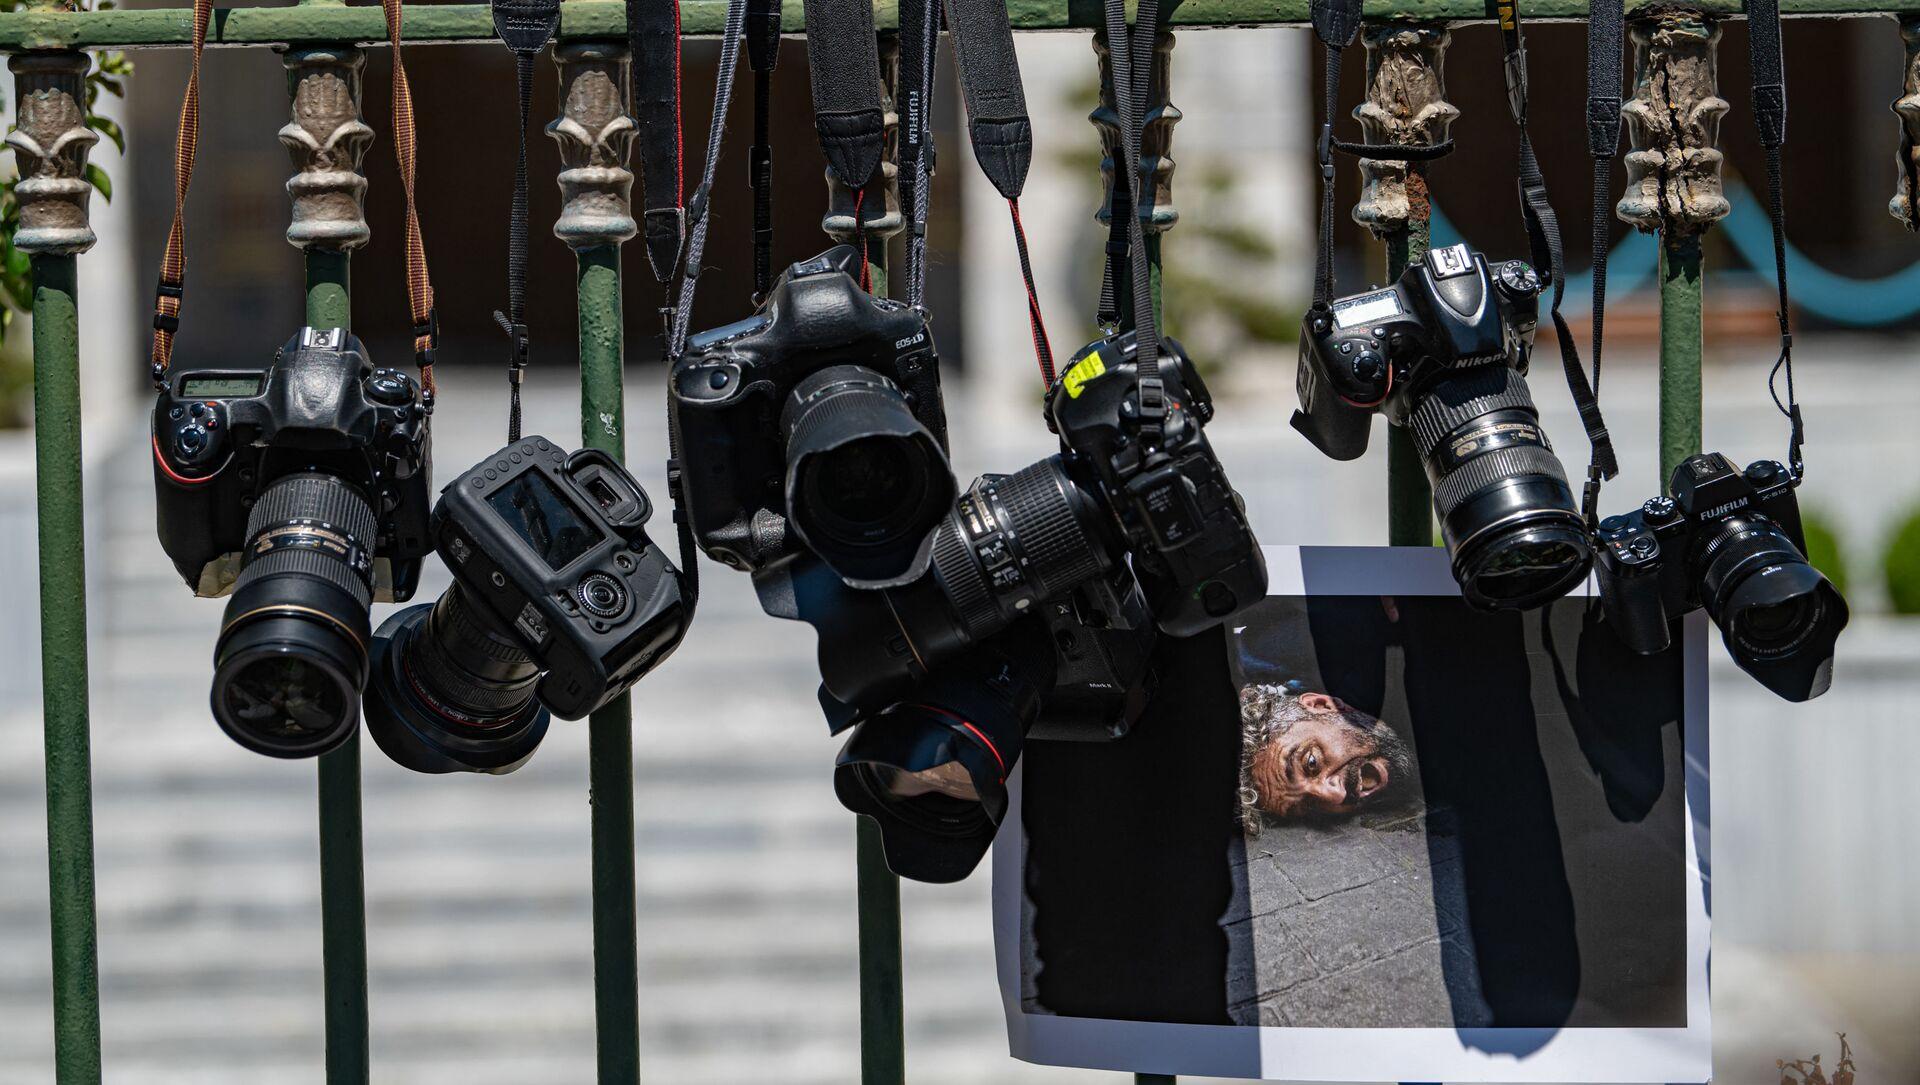 Фотоаппараты висят на решетке, фото из архива - Sputnik Azərbaycan, 1920, 19.08.2021